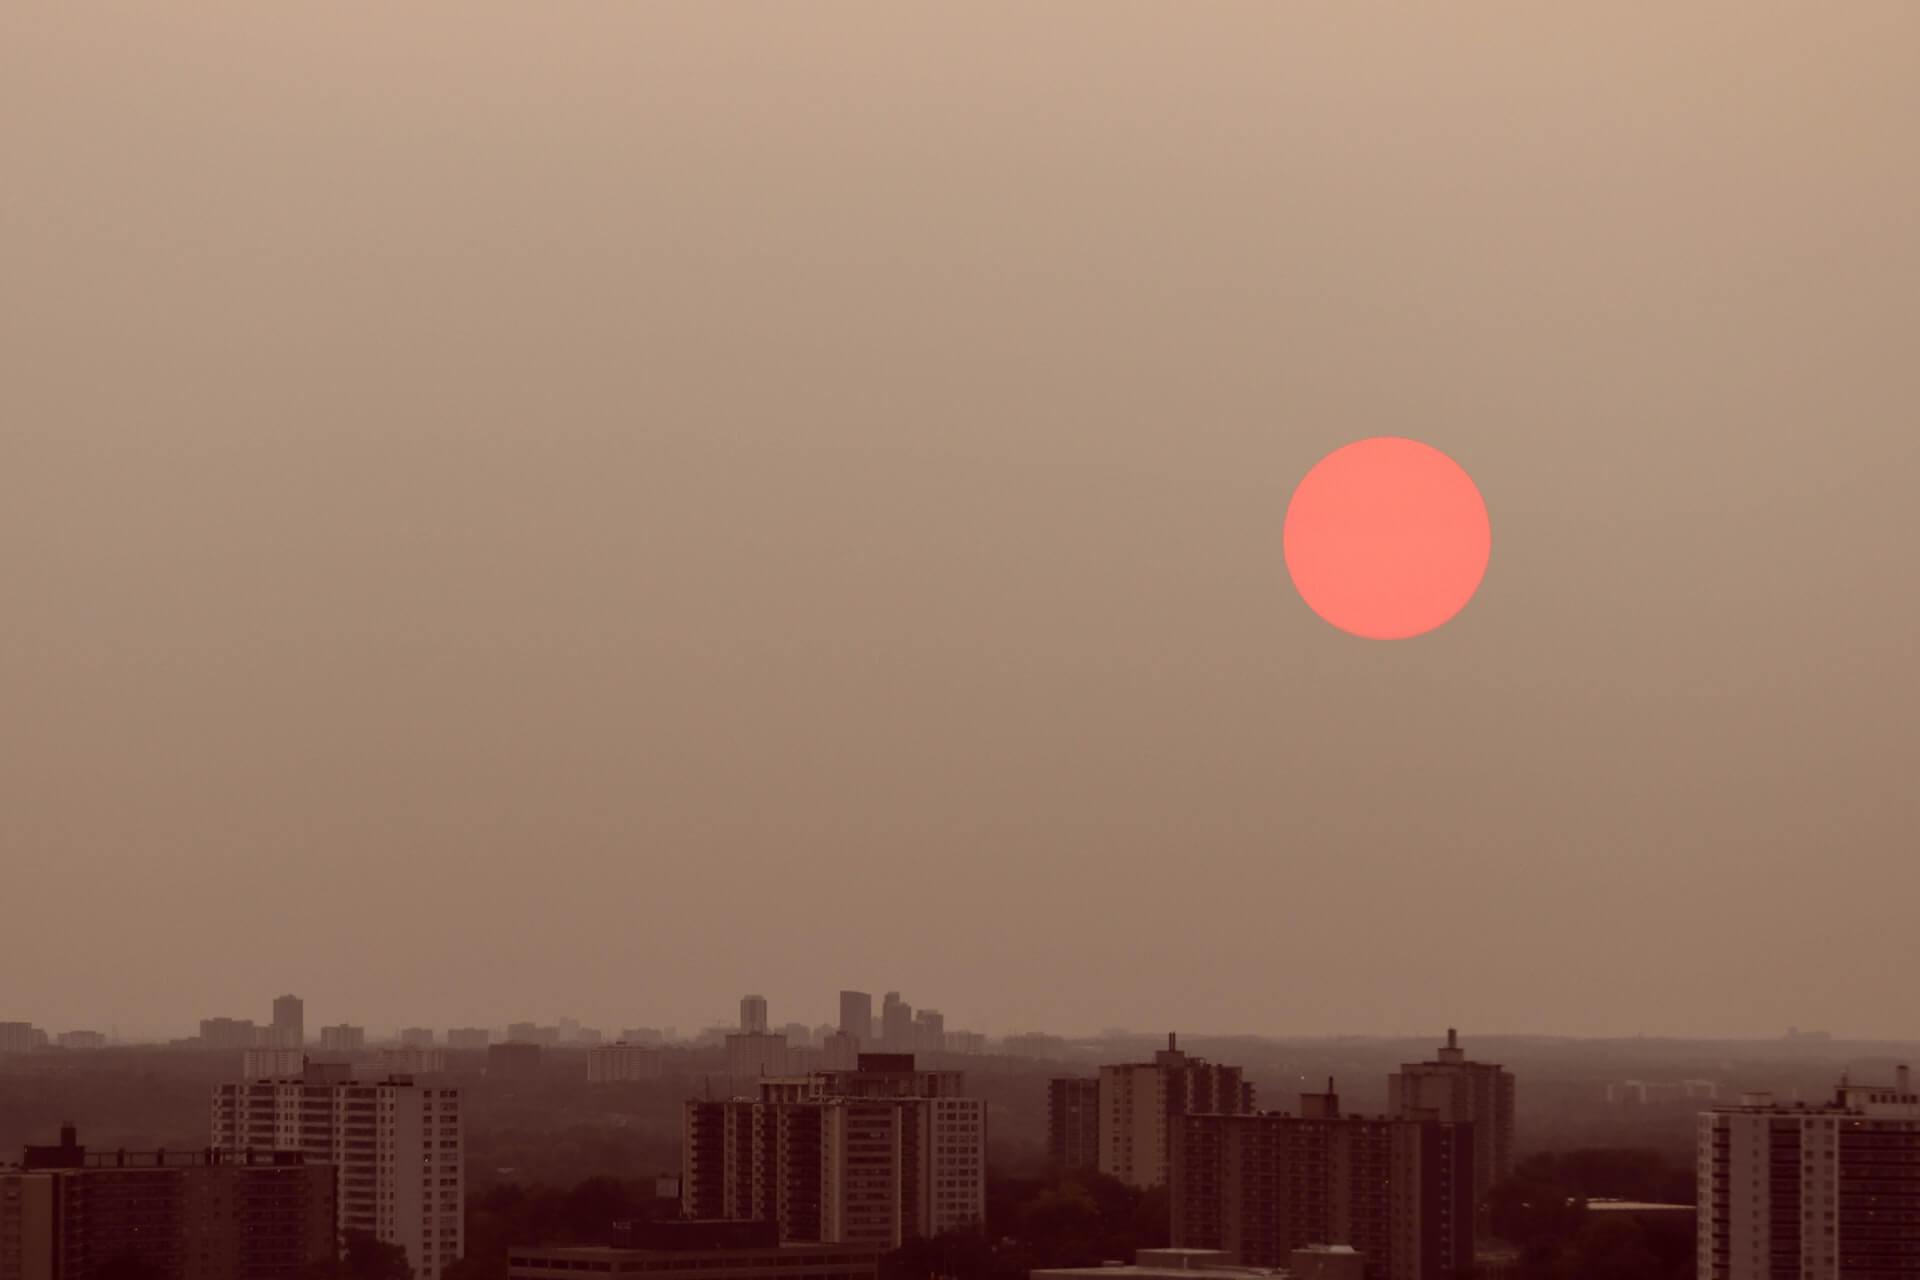 Wildfire Smoke by designecologist